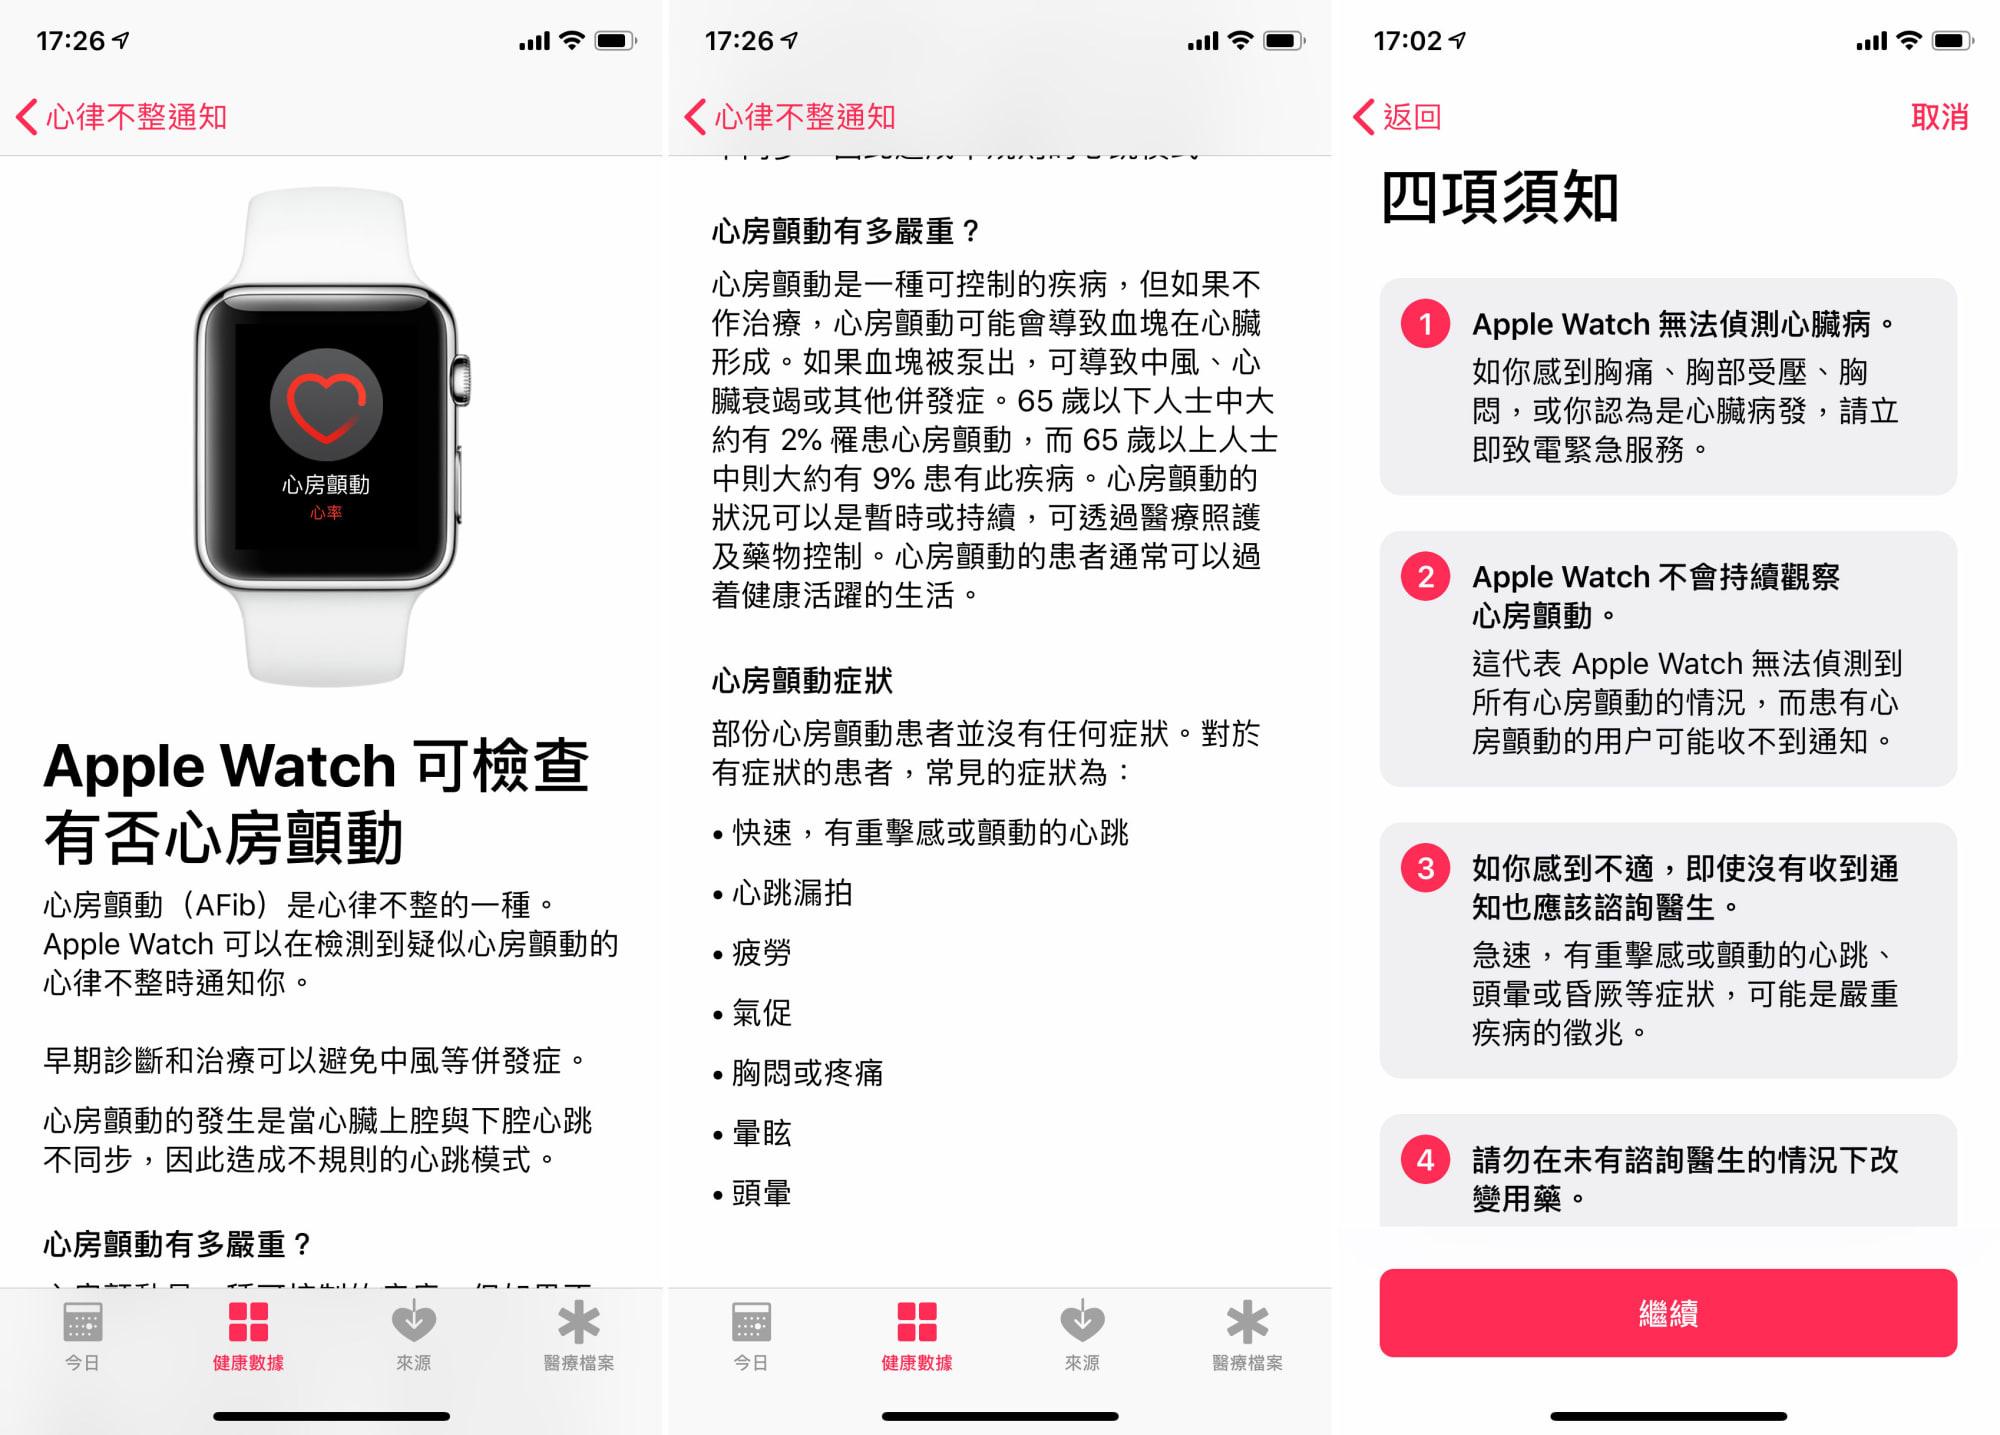 Apple Watch ECG HK